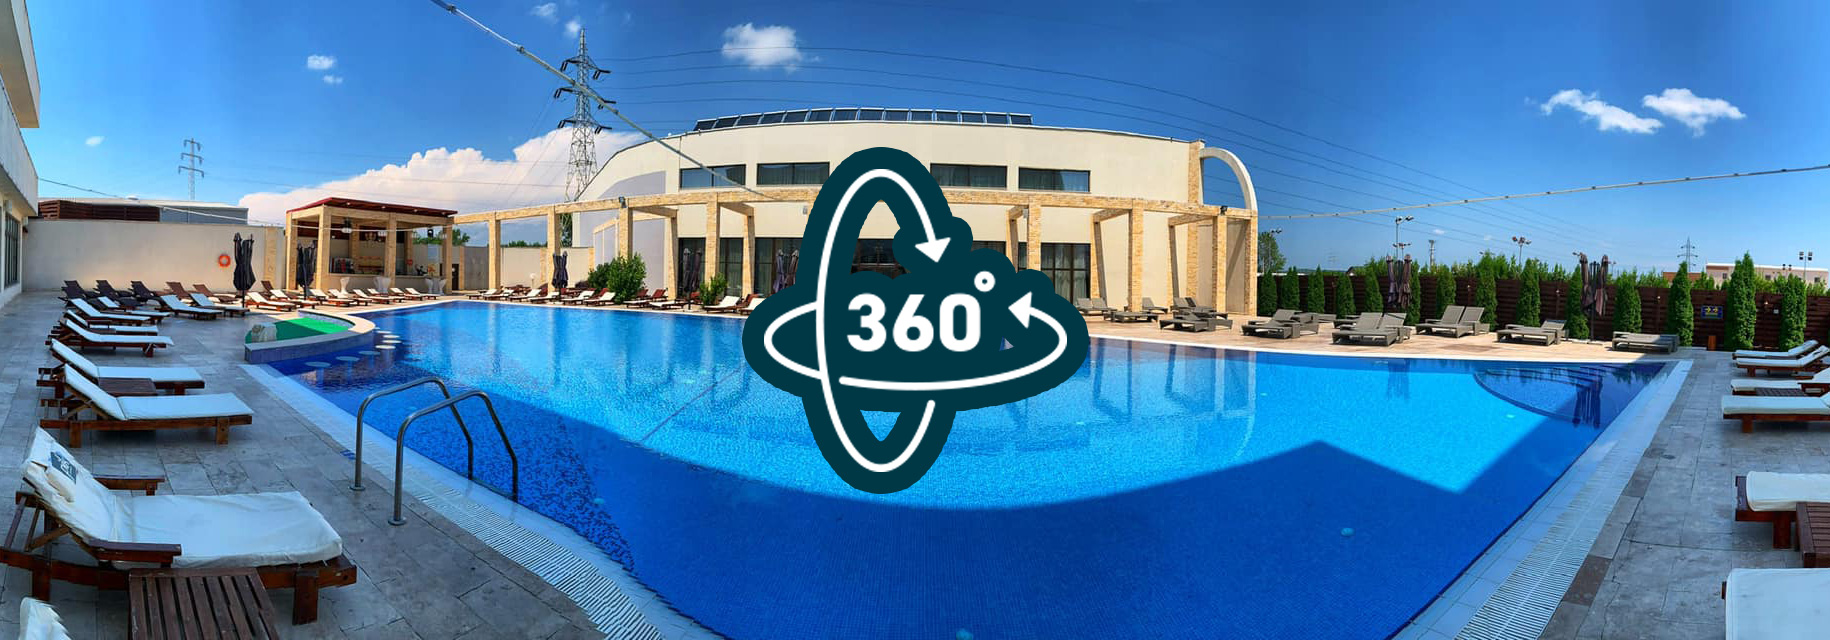 tur-virual-360